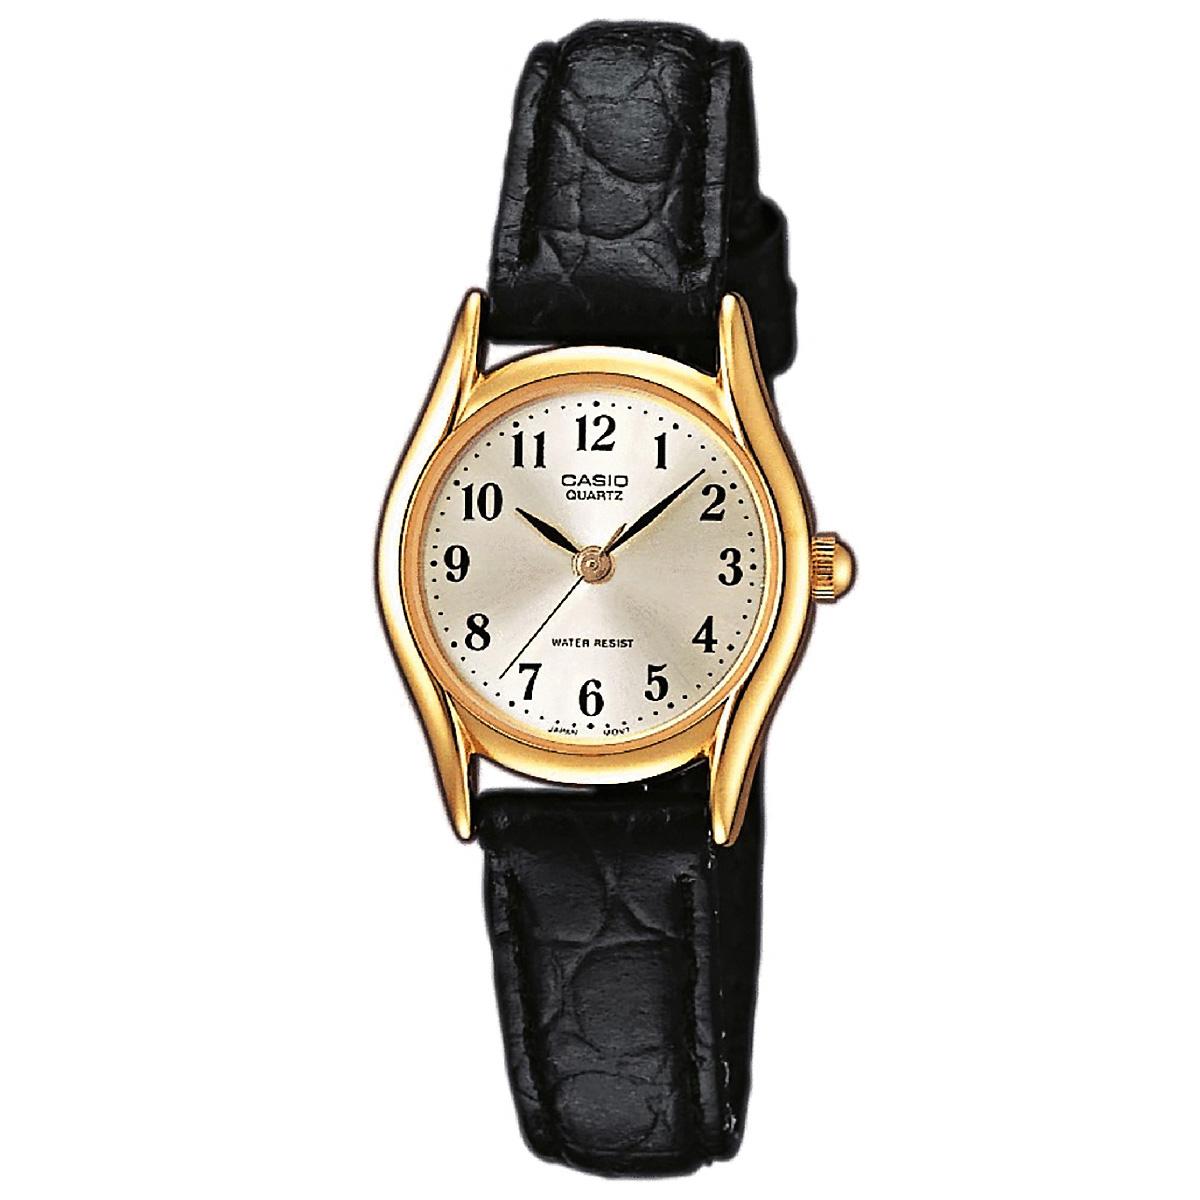 casio damenuhr ltp 1154pq 7b2 armbanduhr leder gold schwarz lady watch neu ovp ebay. Black Bedroom Furniture Sets. Home Design Ideas